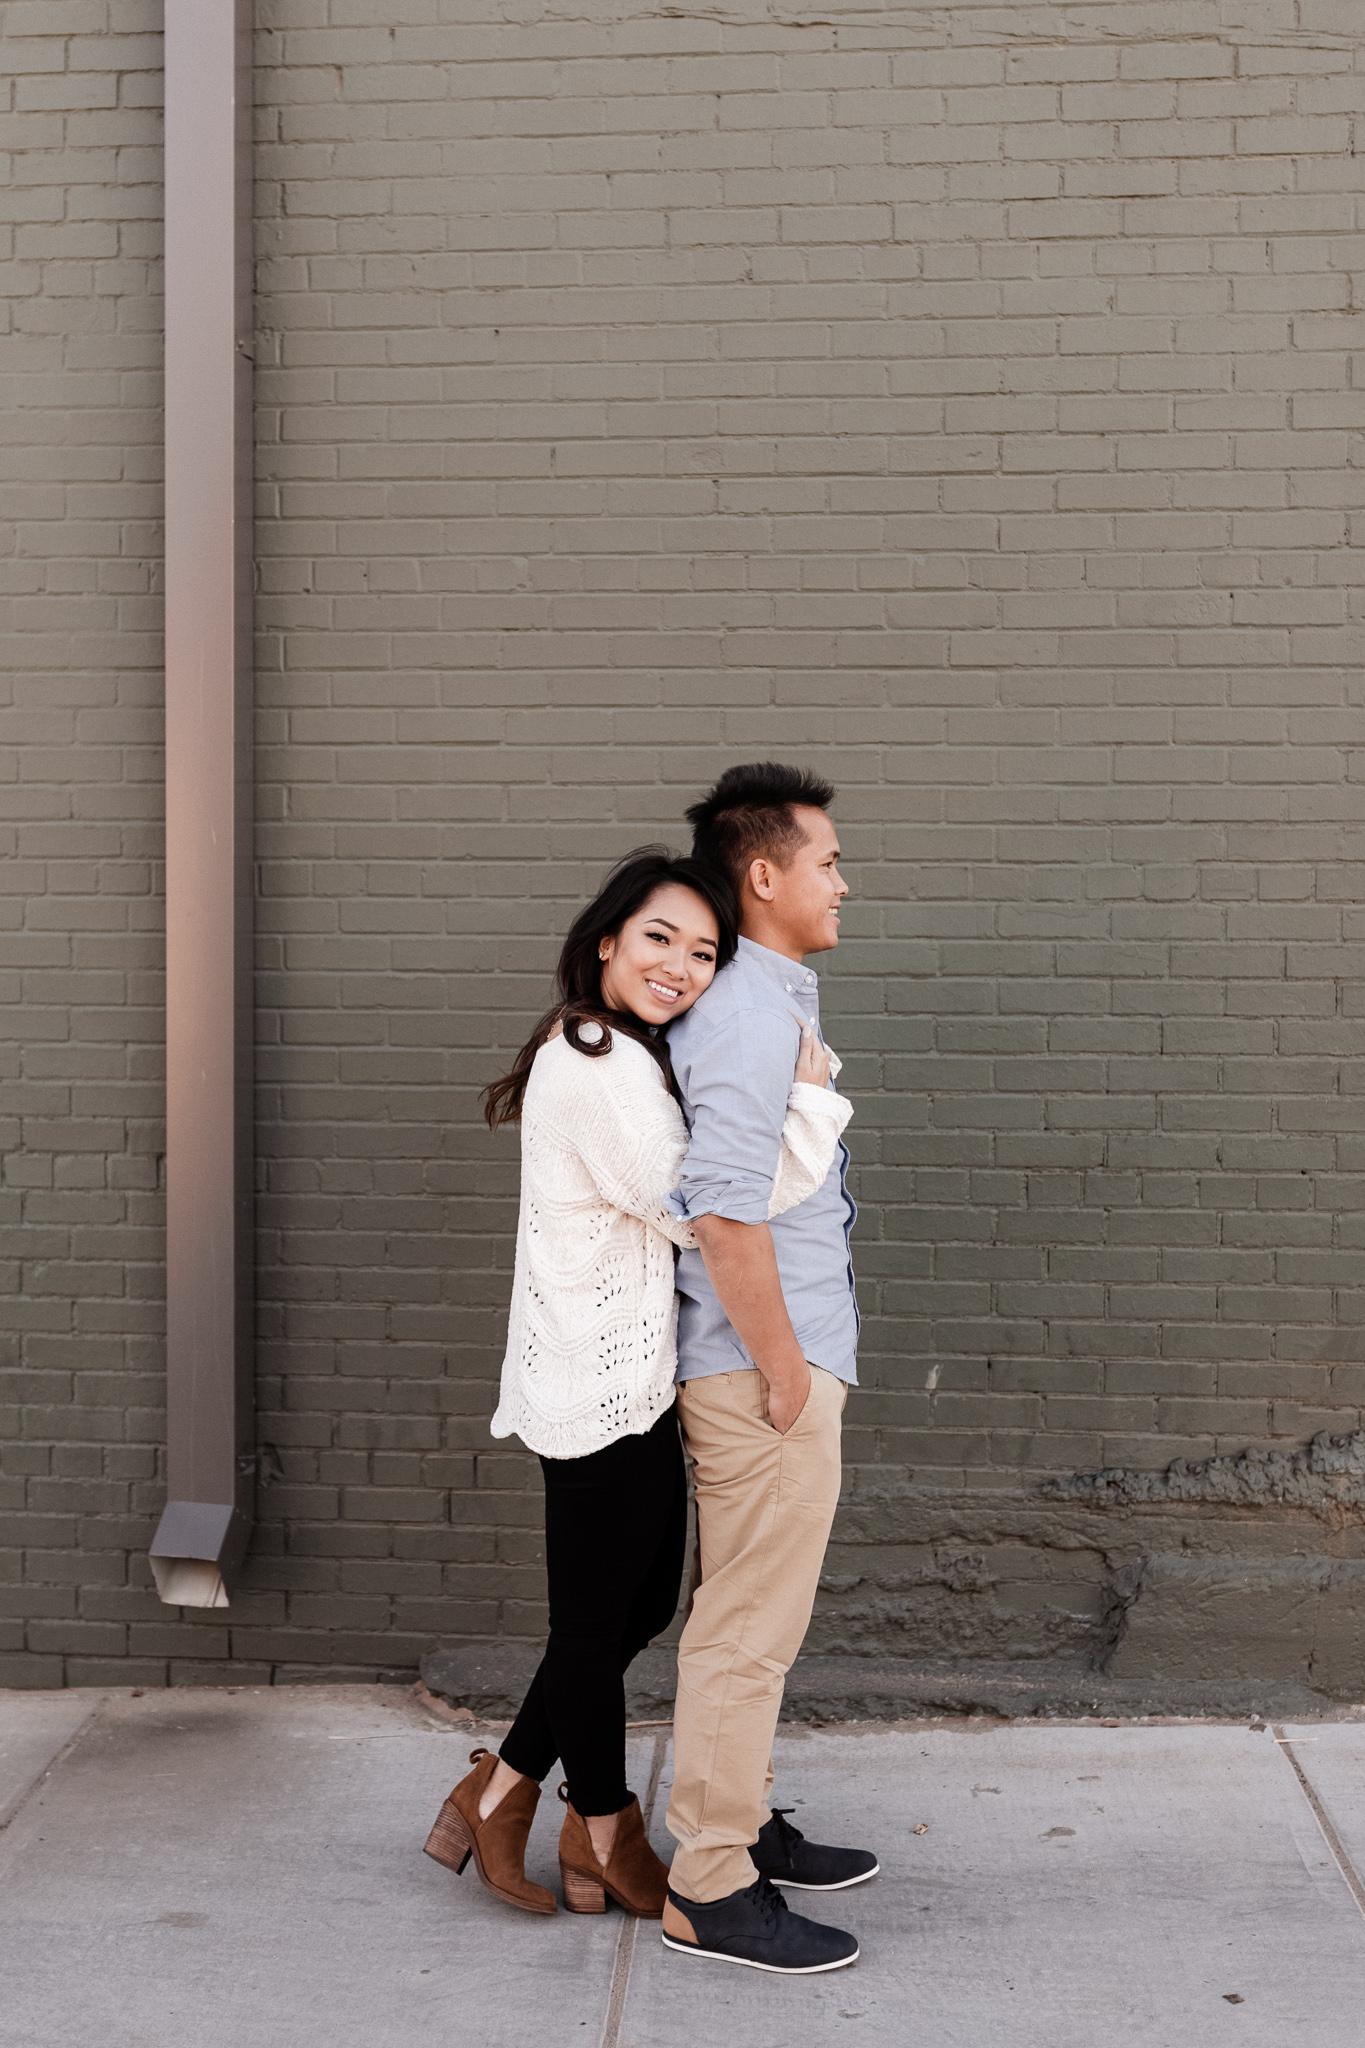 Hieu + Teresa | Colorful Romantic Downtown Engagements | Oklahoma Wedding Photographer-47.jpg